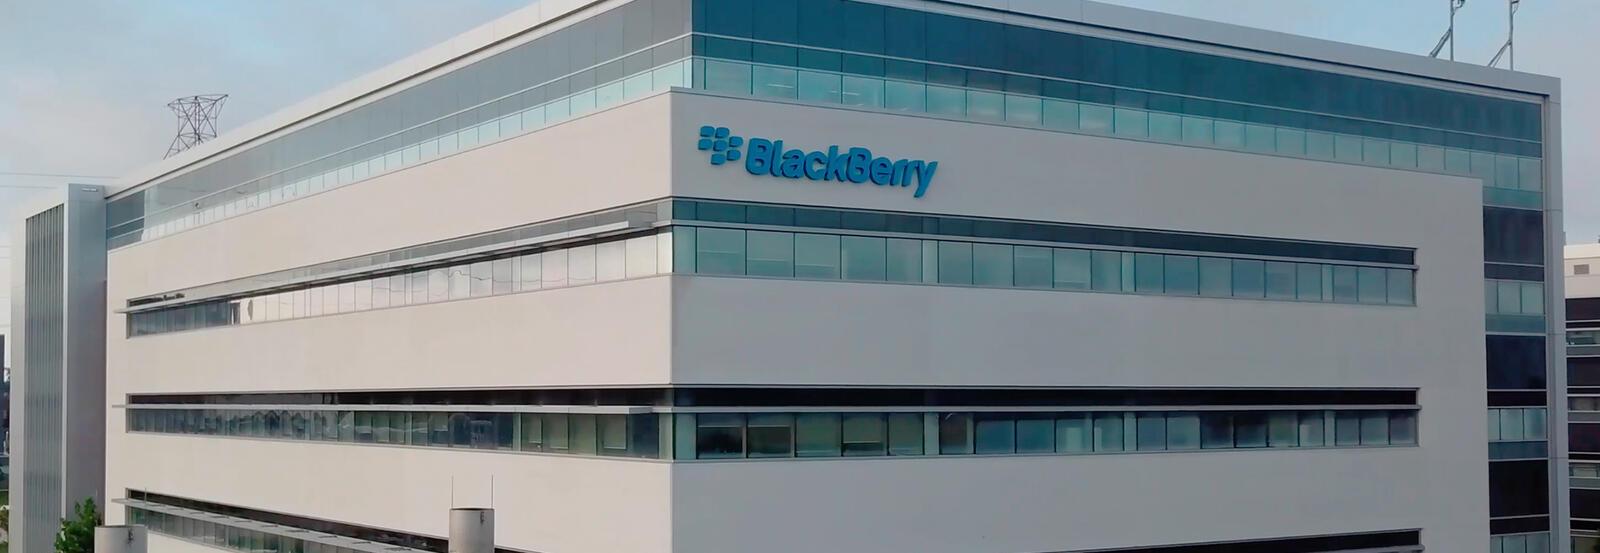 Blackberry office